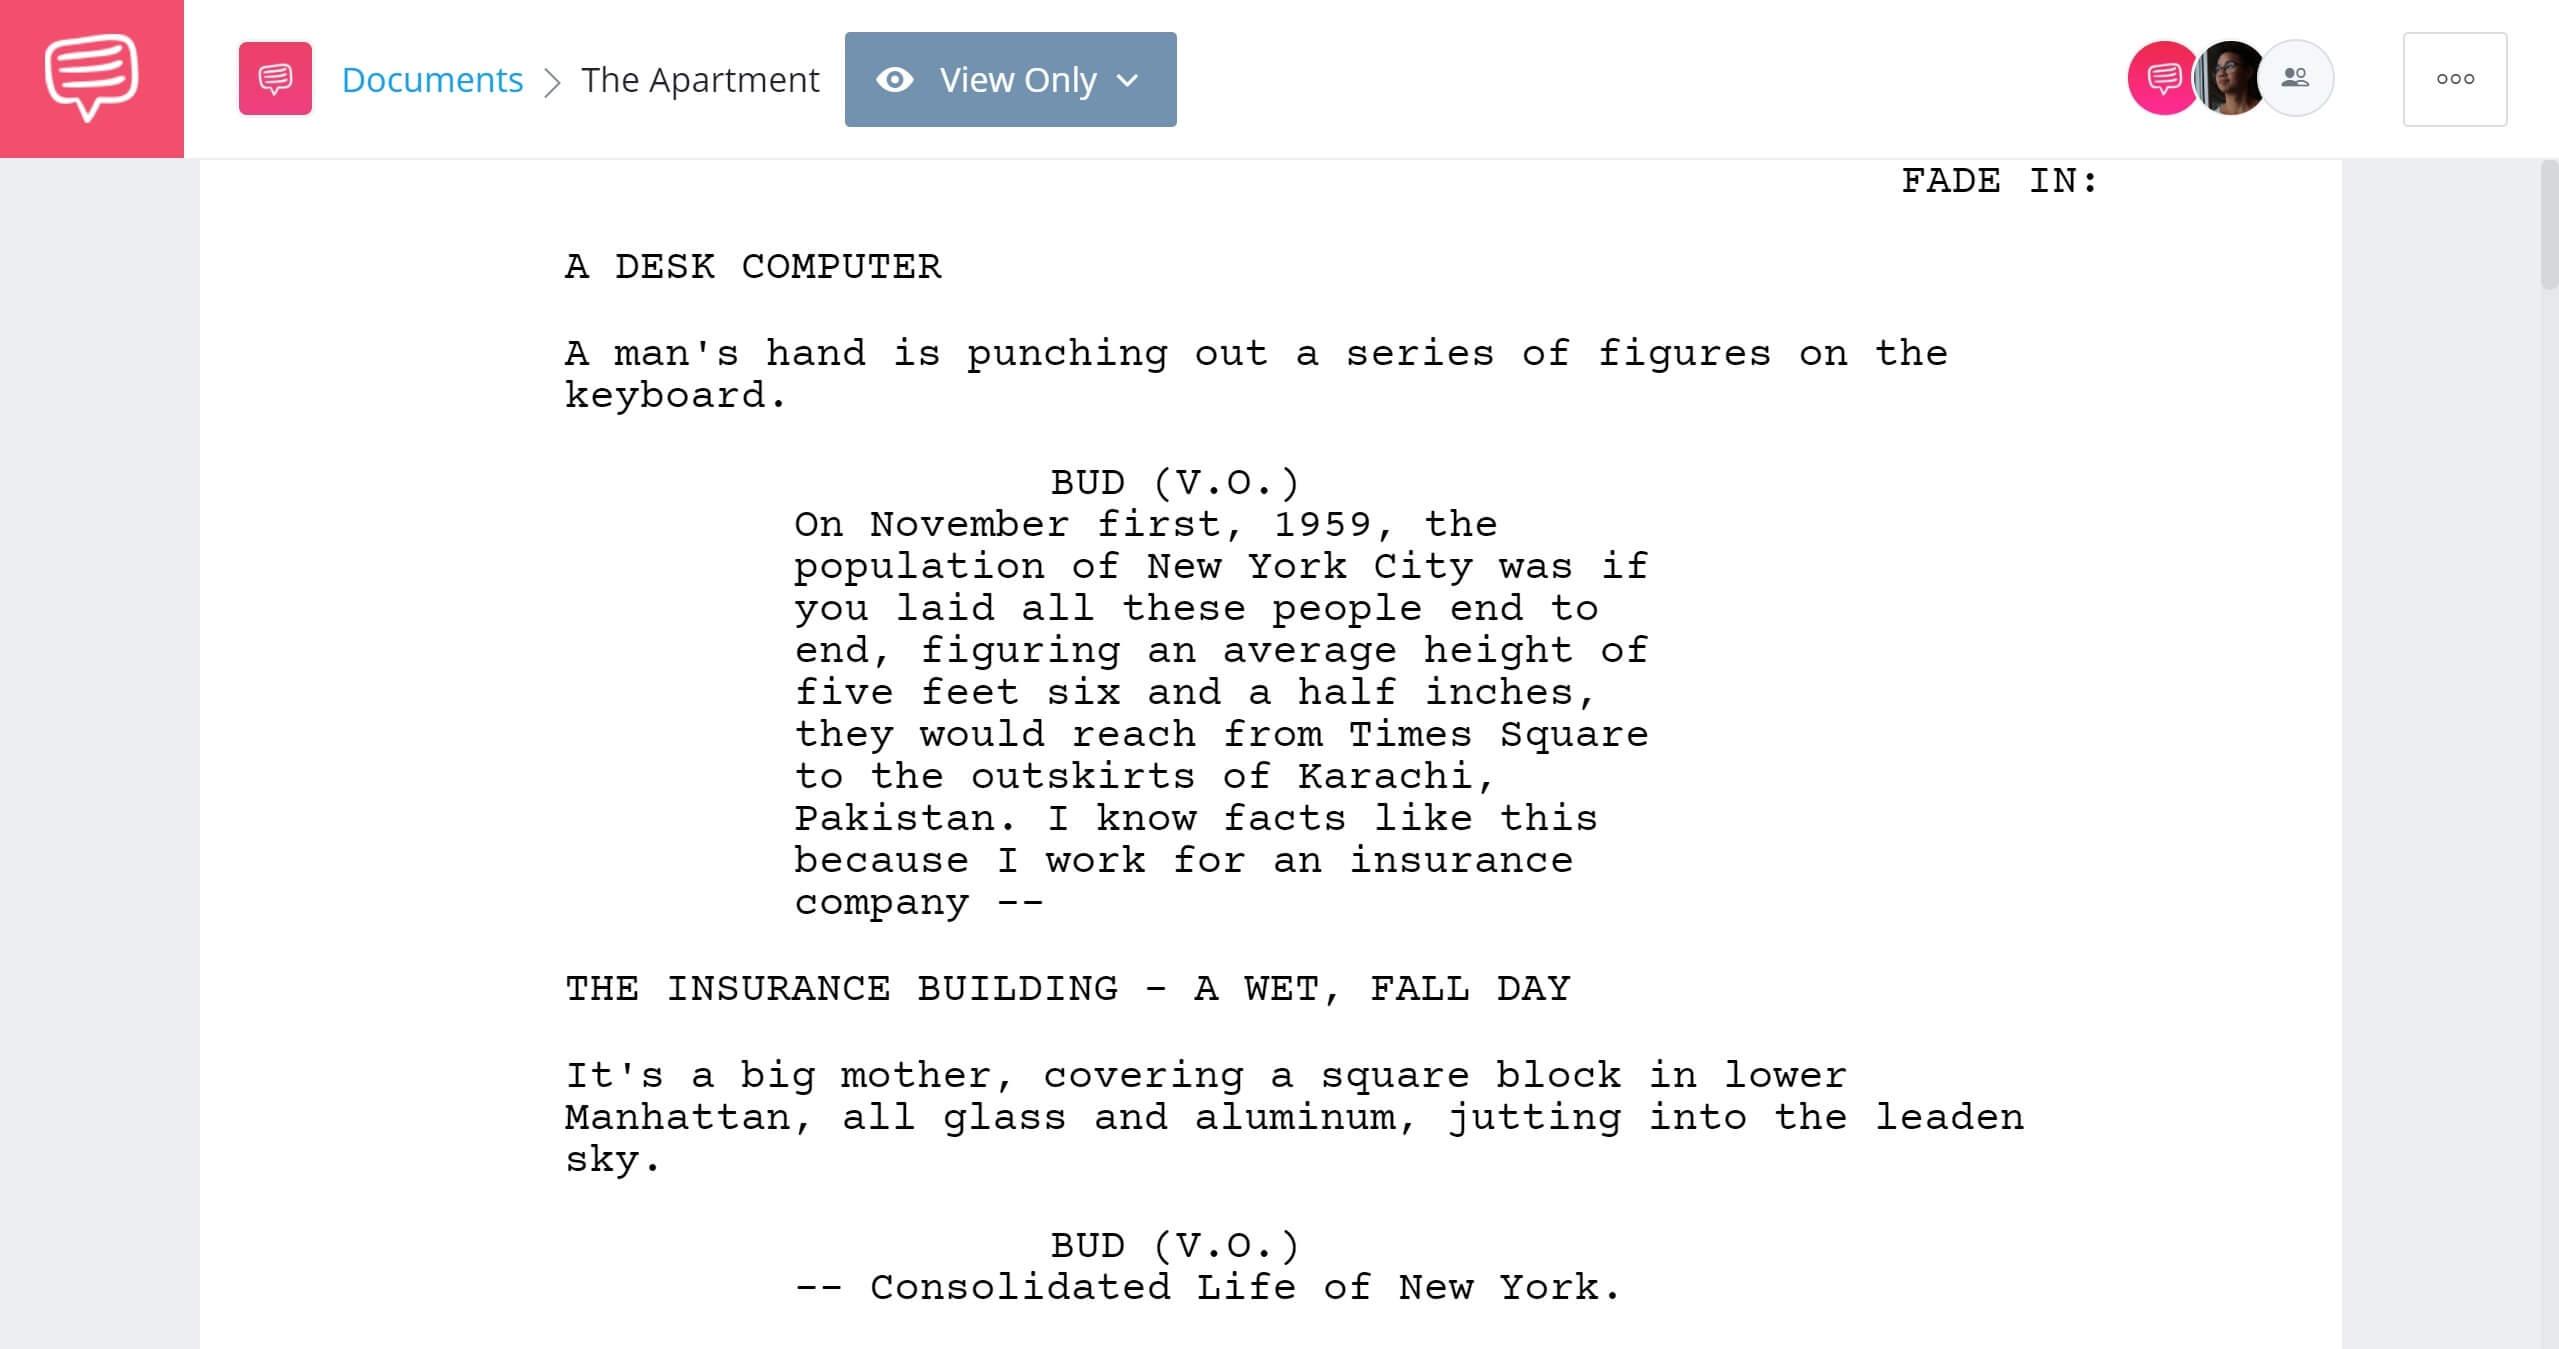 Best Original Screenplay Academy Award - The Apartment Full Script PDF Download - StudioBinder Screenwriting Software